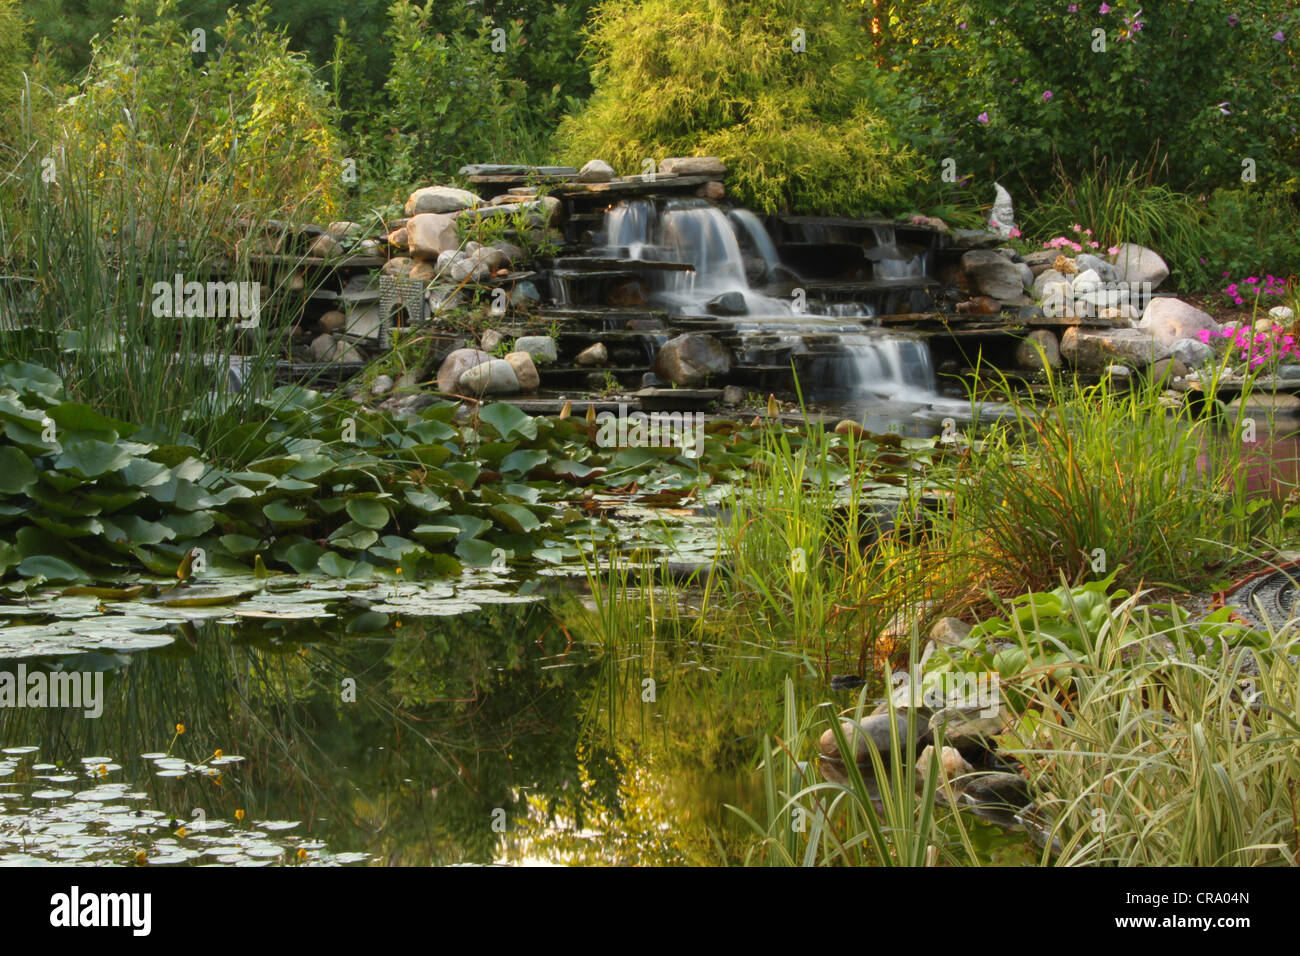 Backyard Water Garden with Waterfall. Scene from a back yard Water Garden and Garden Train in Centerville, Dayton, - Stock Image